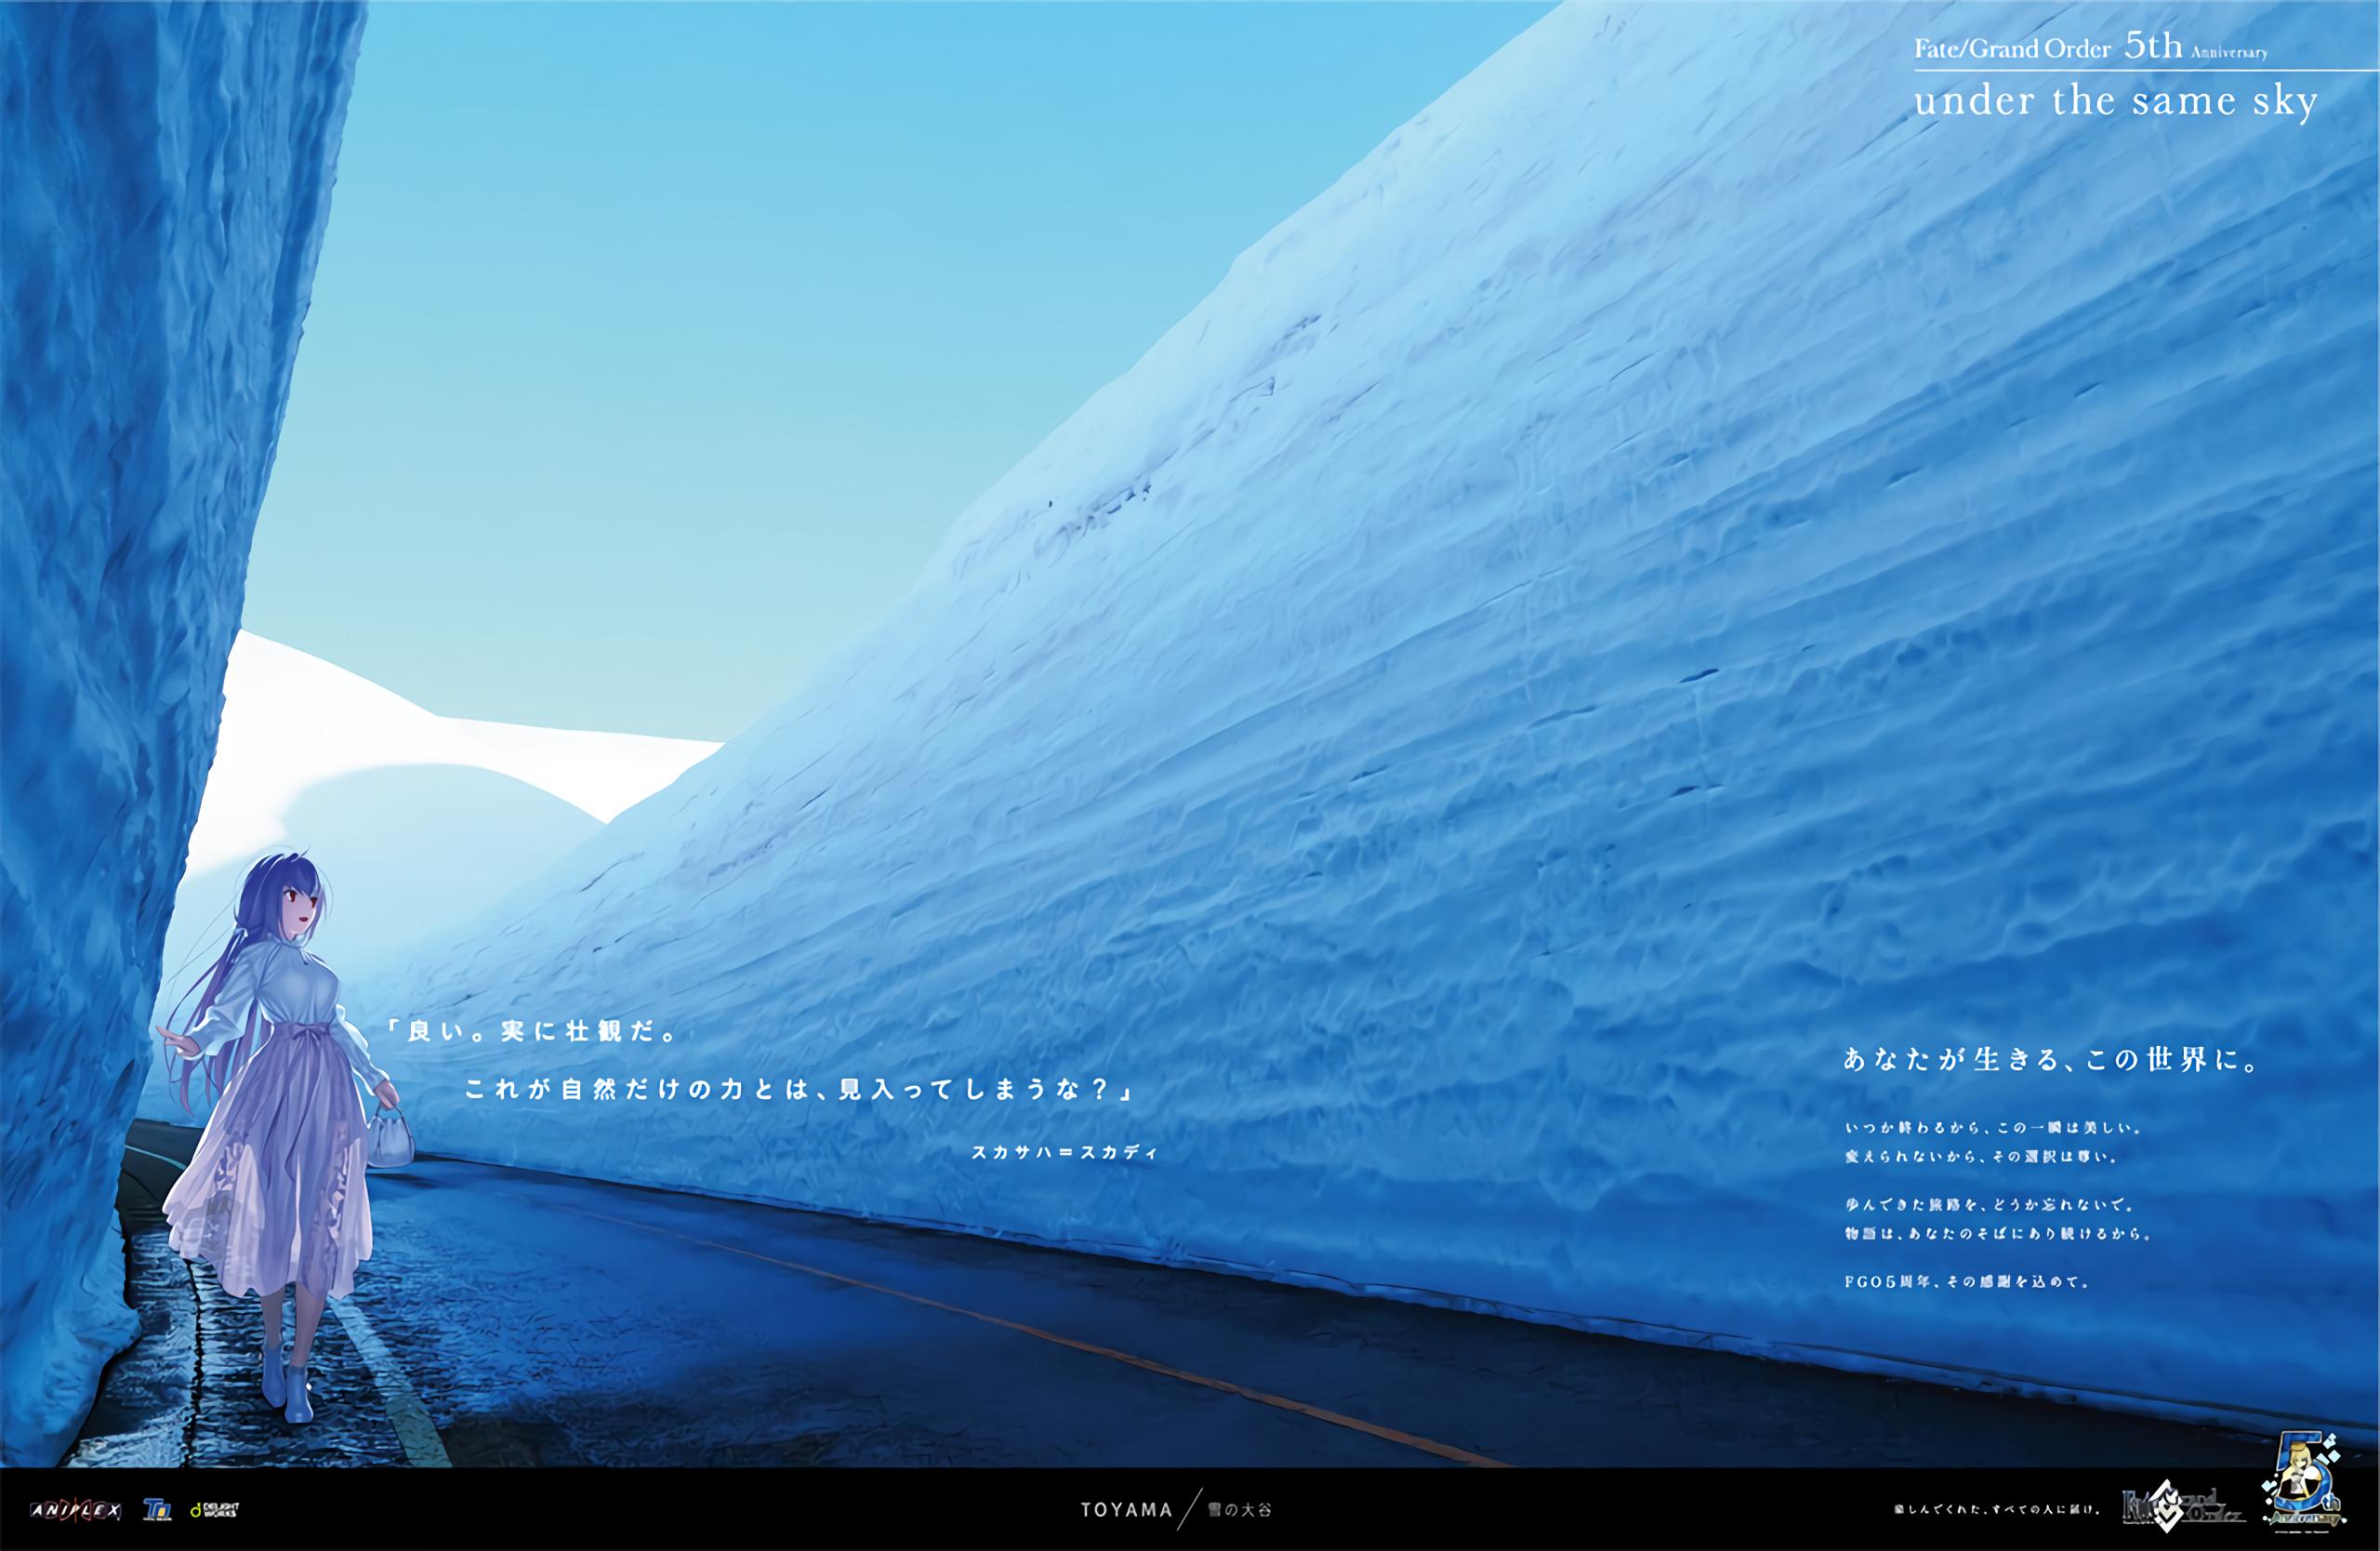 "FGO五周年纪念活动开启""under the same sky""纪念插画发布"